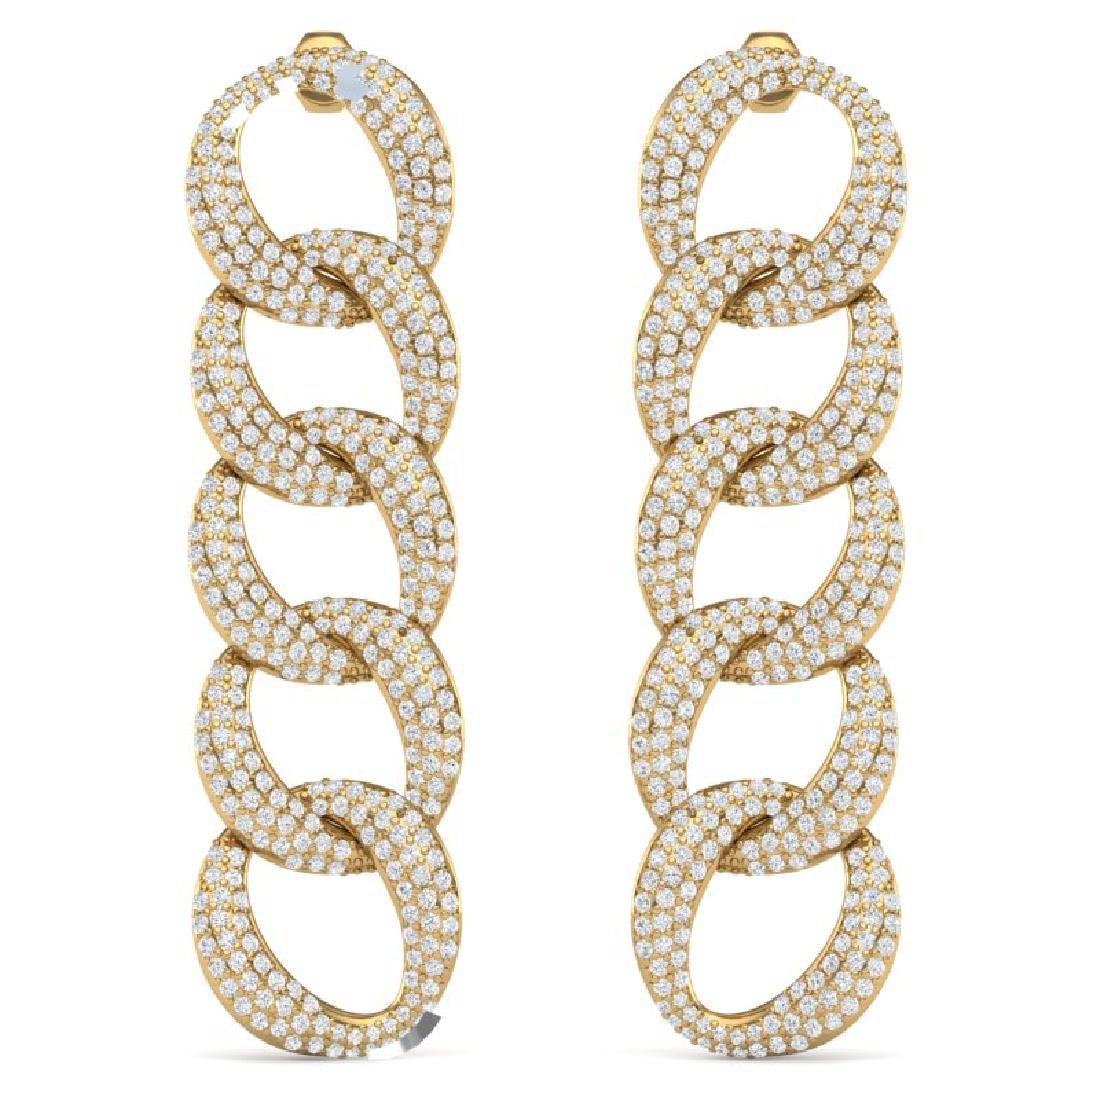 5 CTW Certified VS/SI Diamond Earrings 18K Yellow Gold - 3